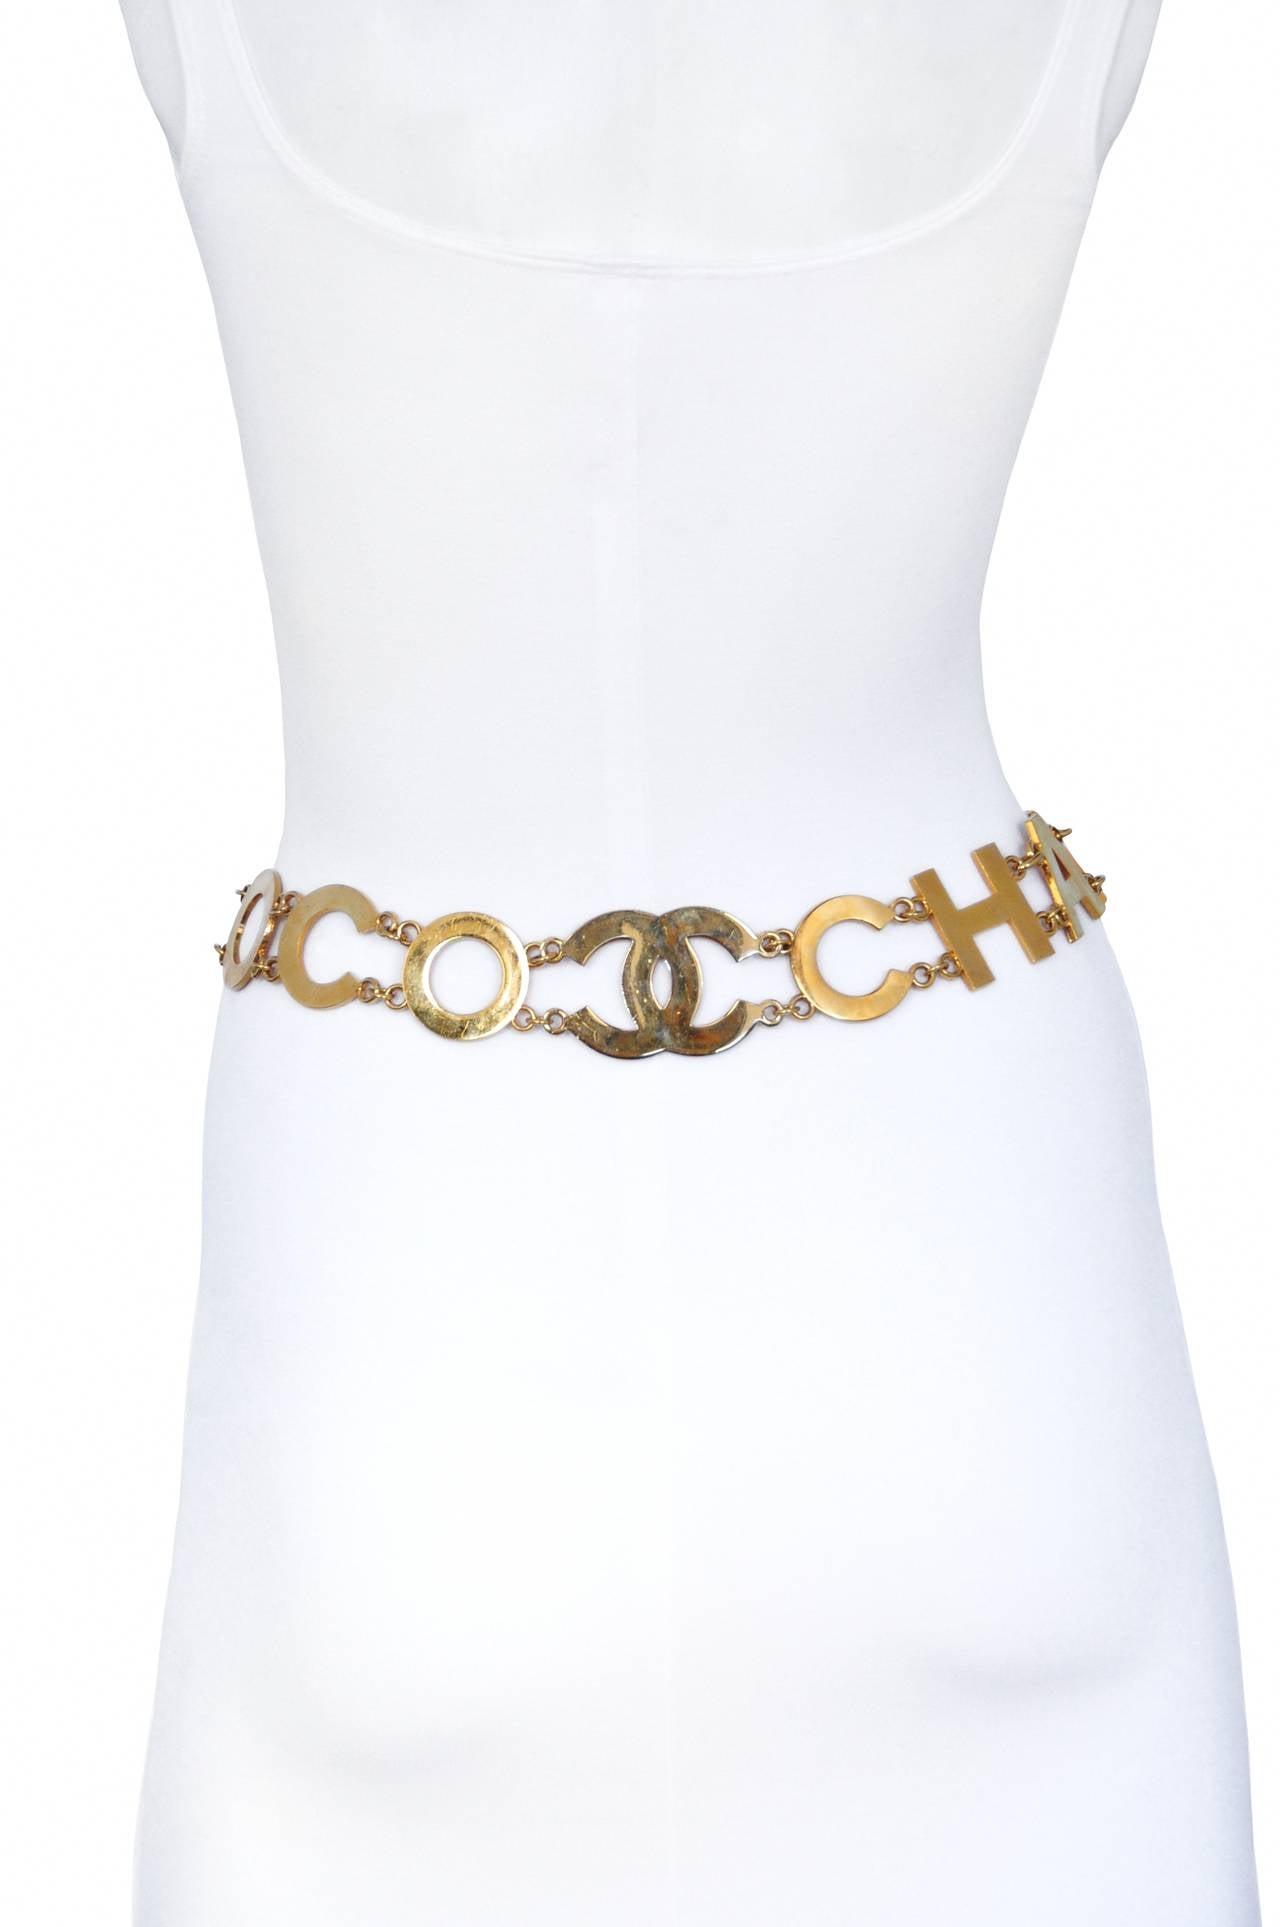 Chanel Coco Logo Belt 2